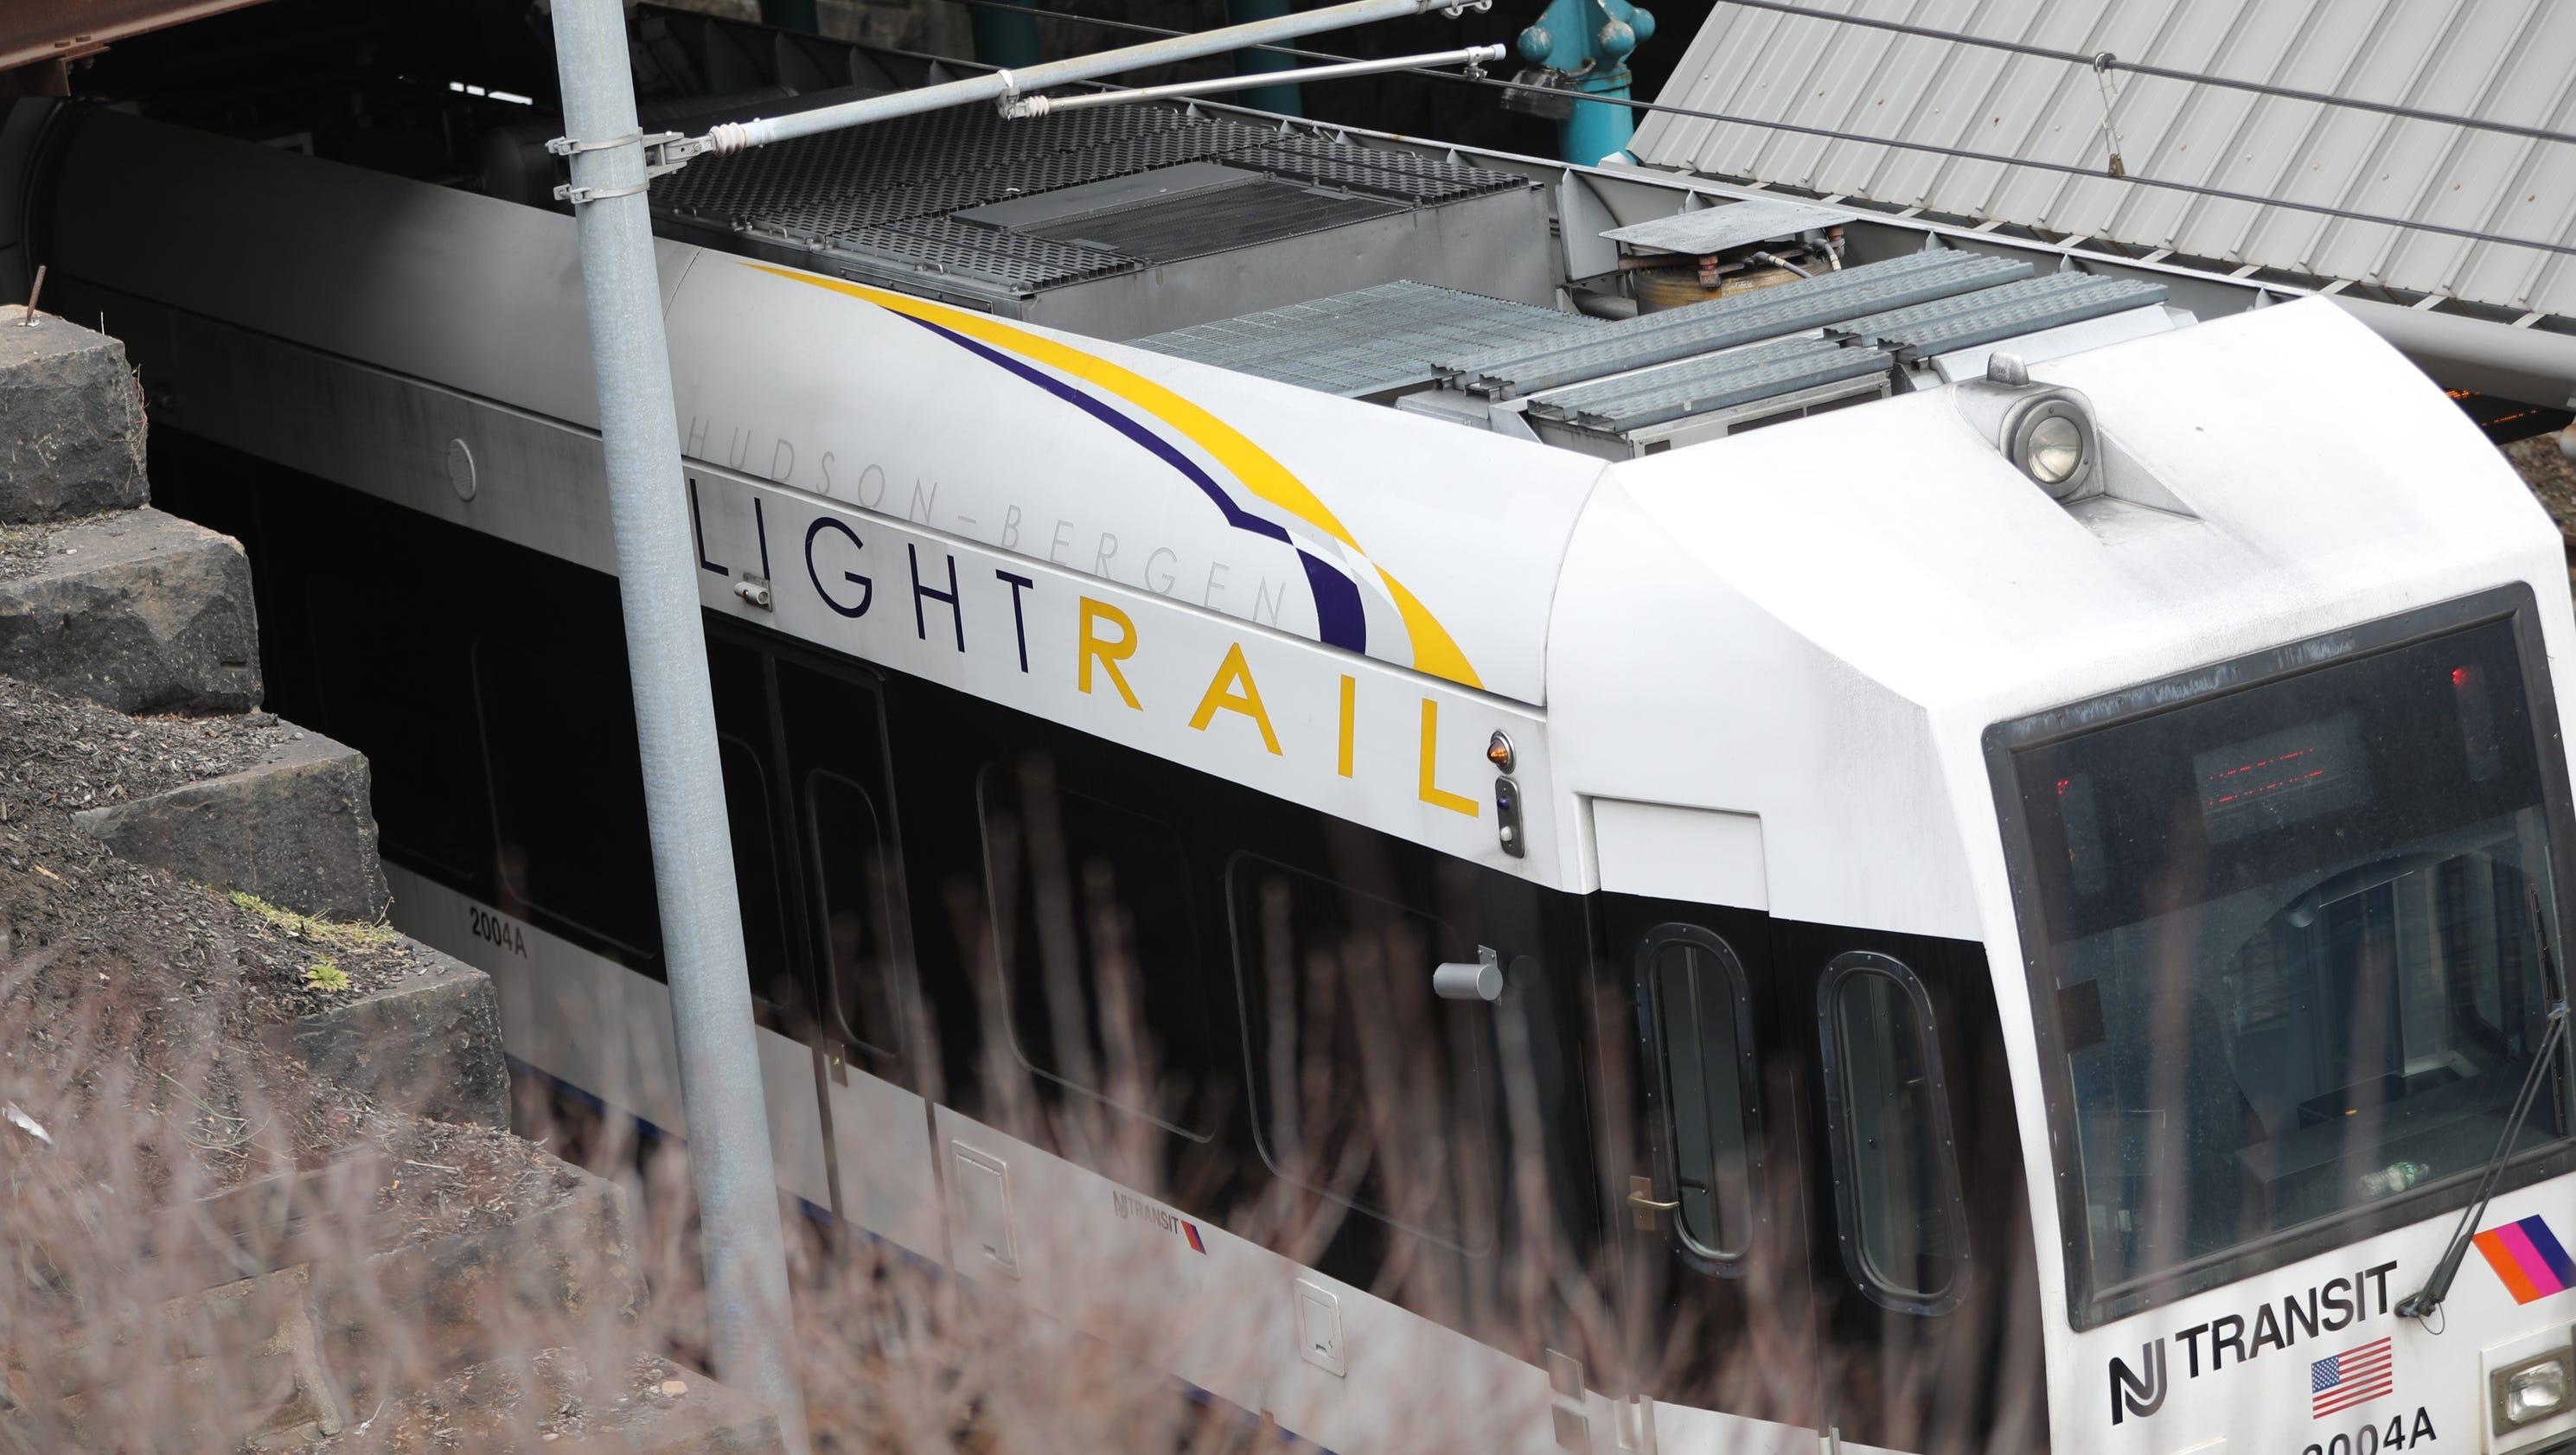 Road Warrior A tiny step forward for Bergen light rail